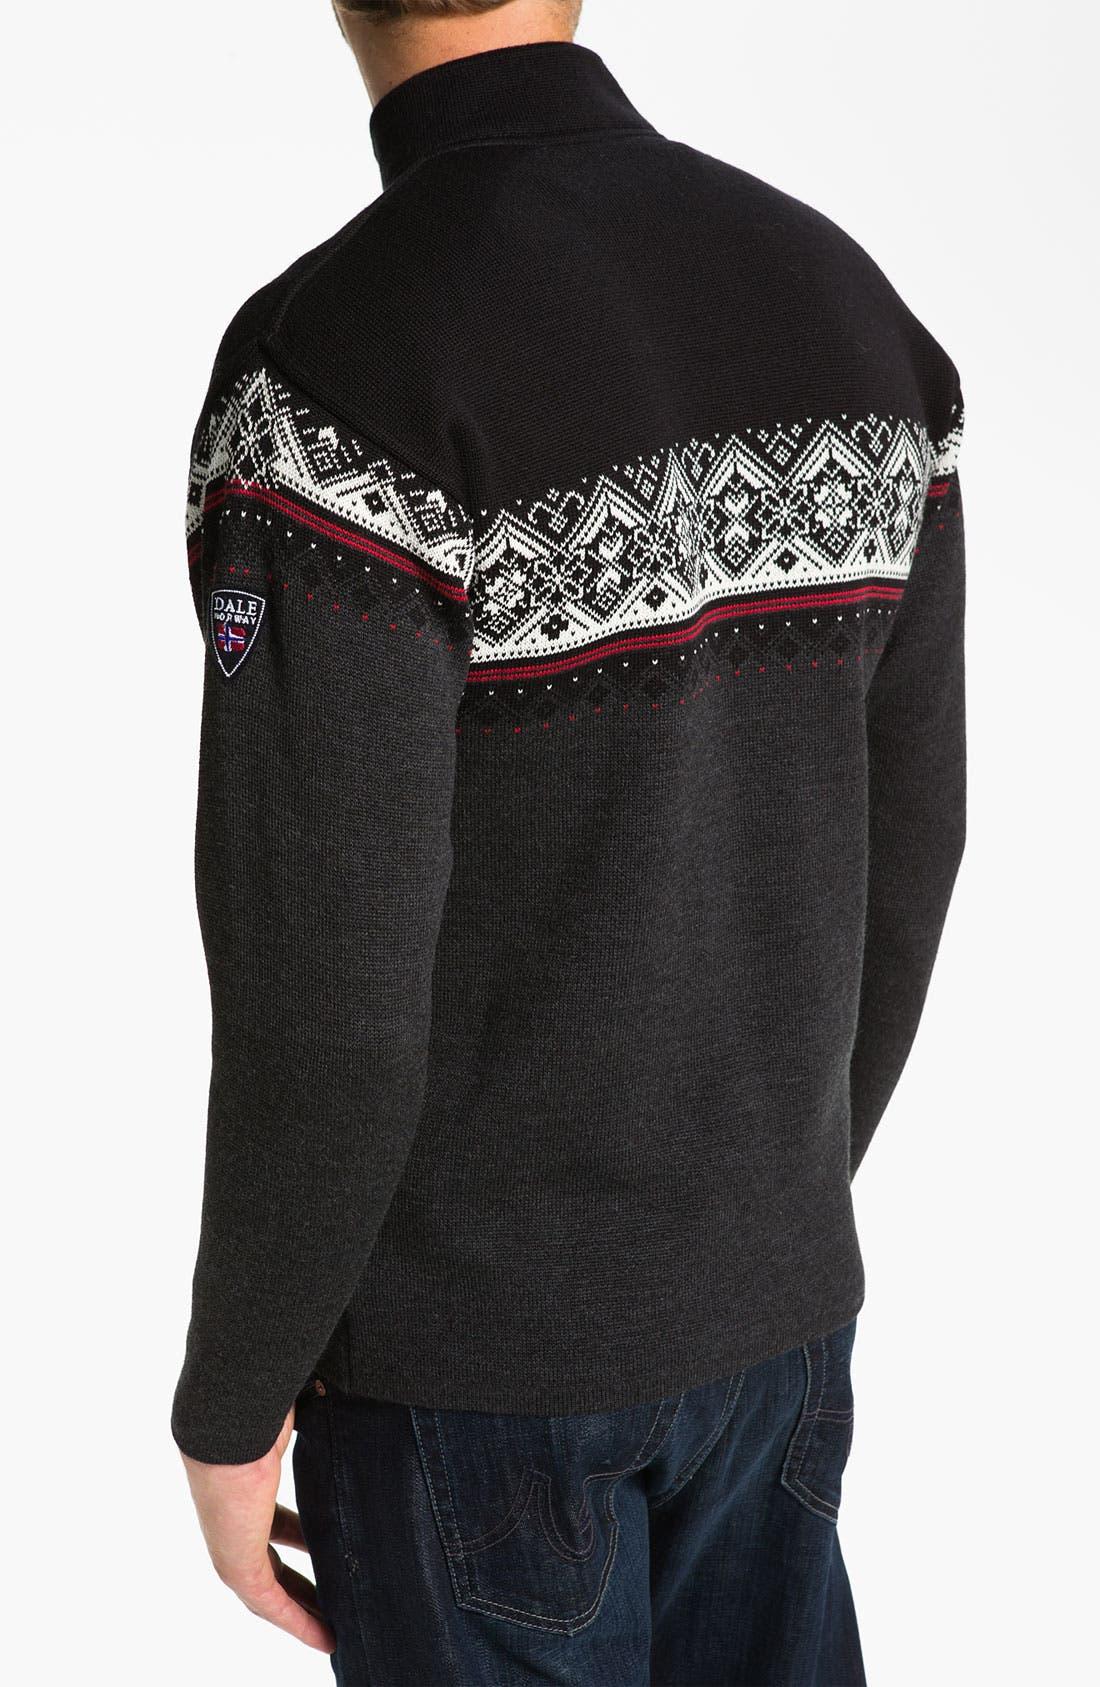 Alternate Image 2  - Dale of Norway 'St Moritz' Quarter Zip Merino Wool Sweater